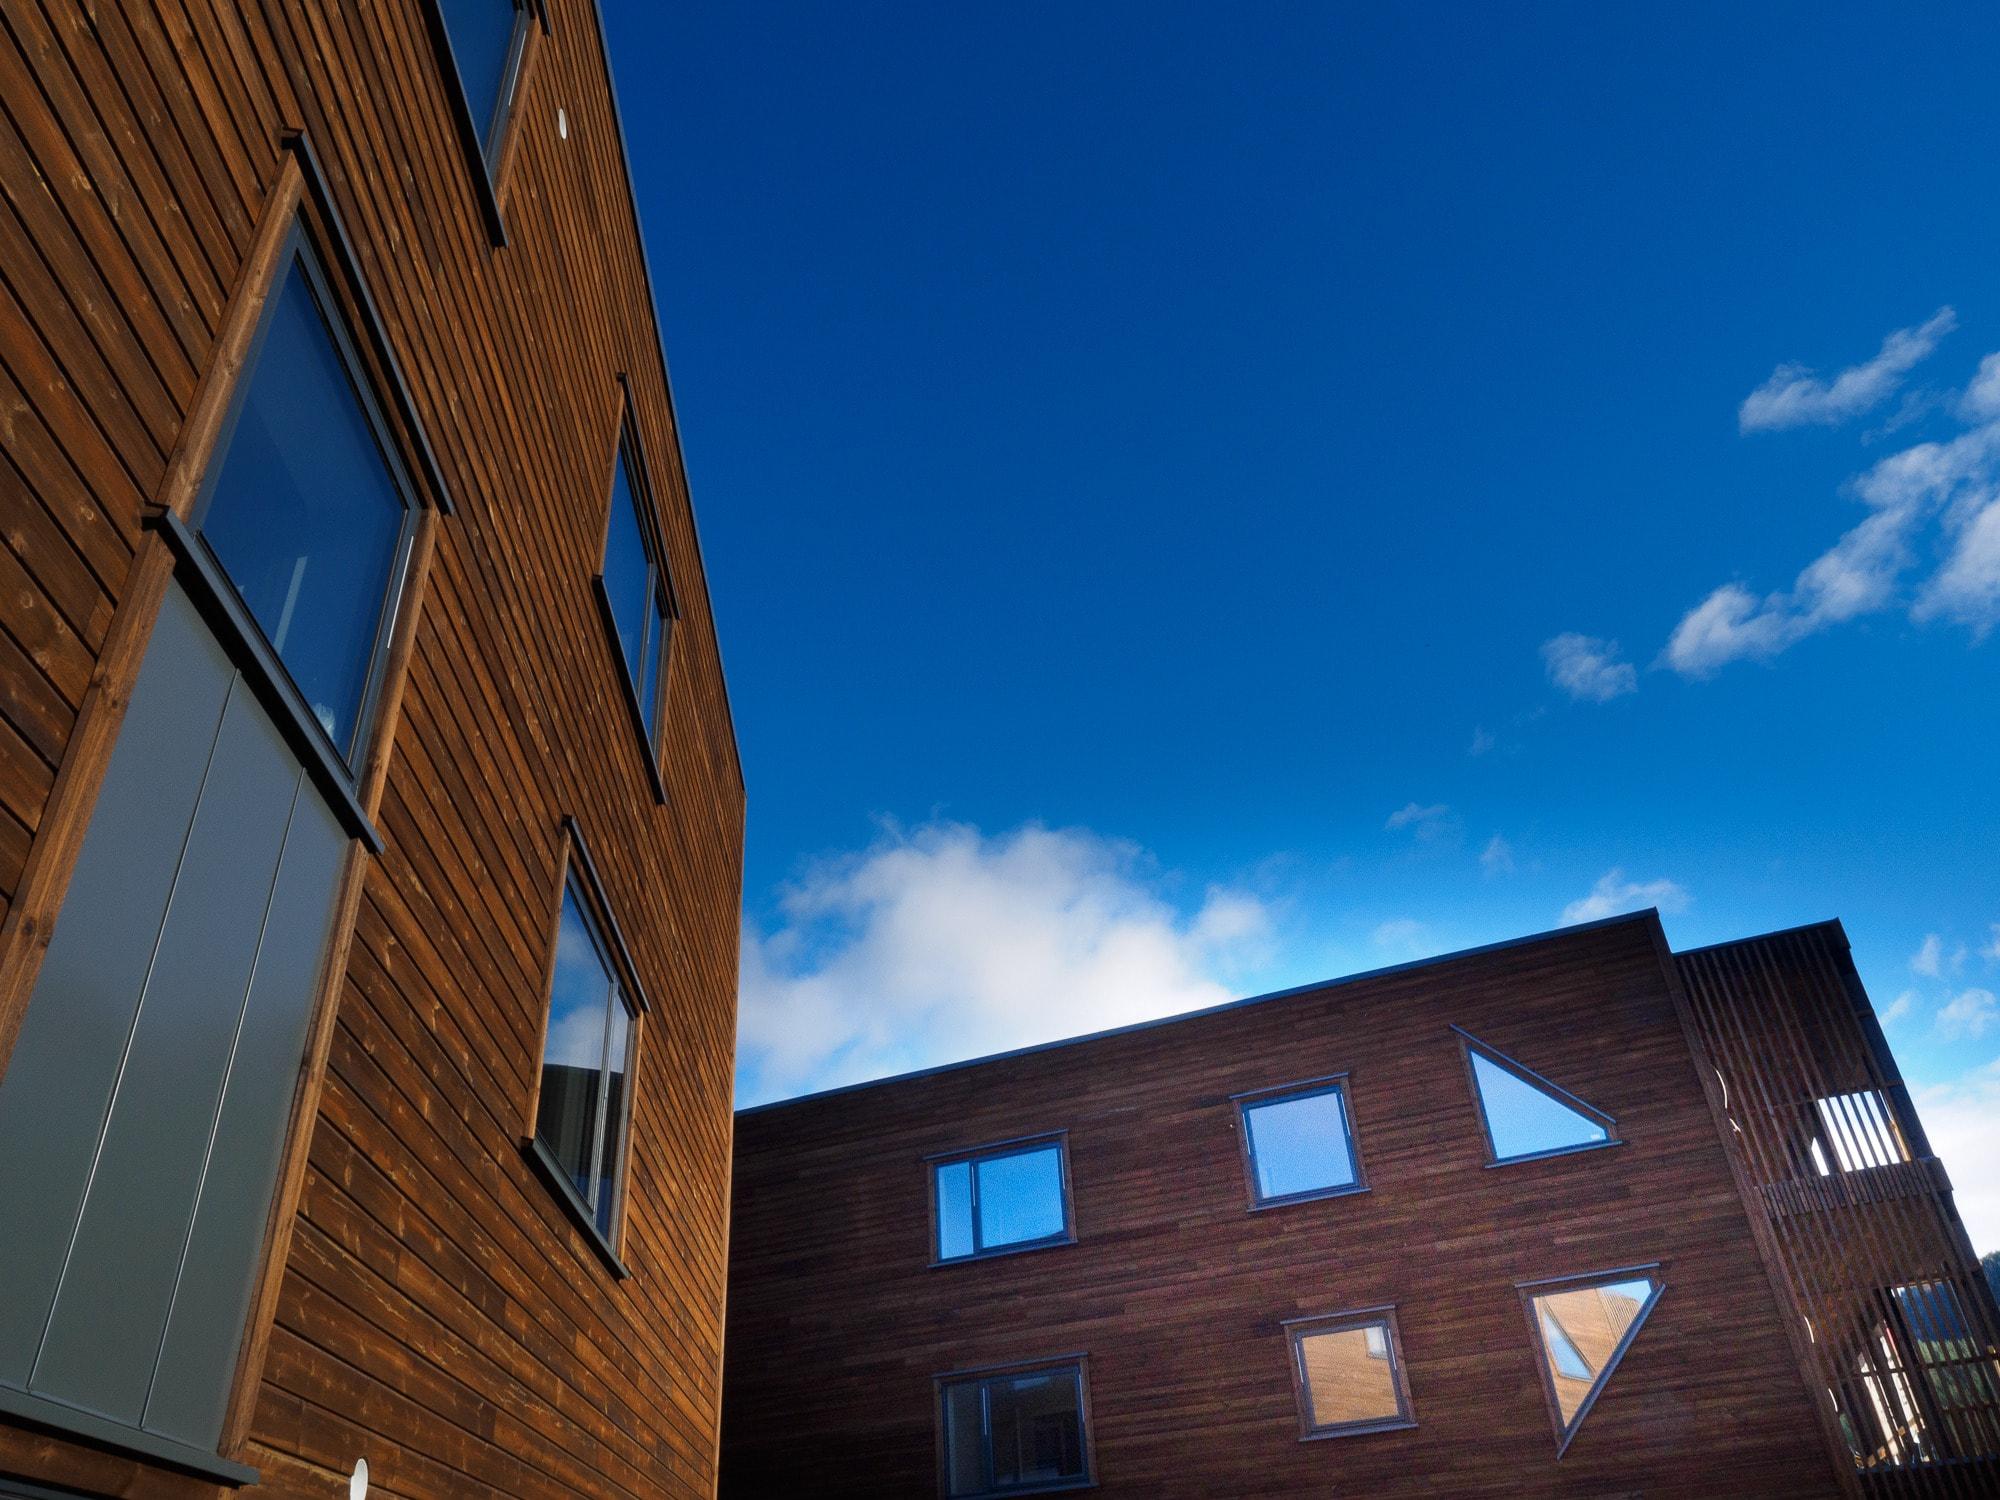 Urban area, Cloud, Facade, House, Building, Daytime, Architecture, Sky, Blue